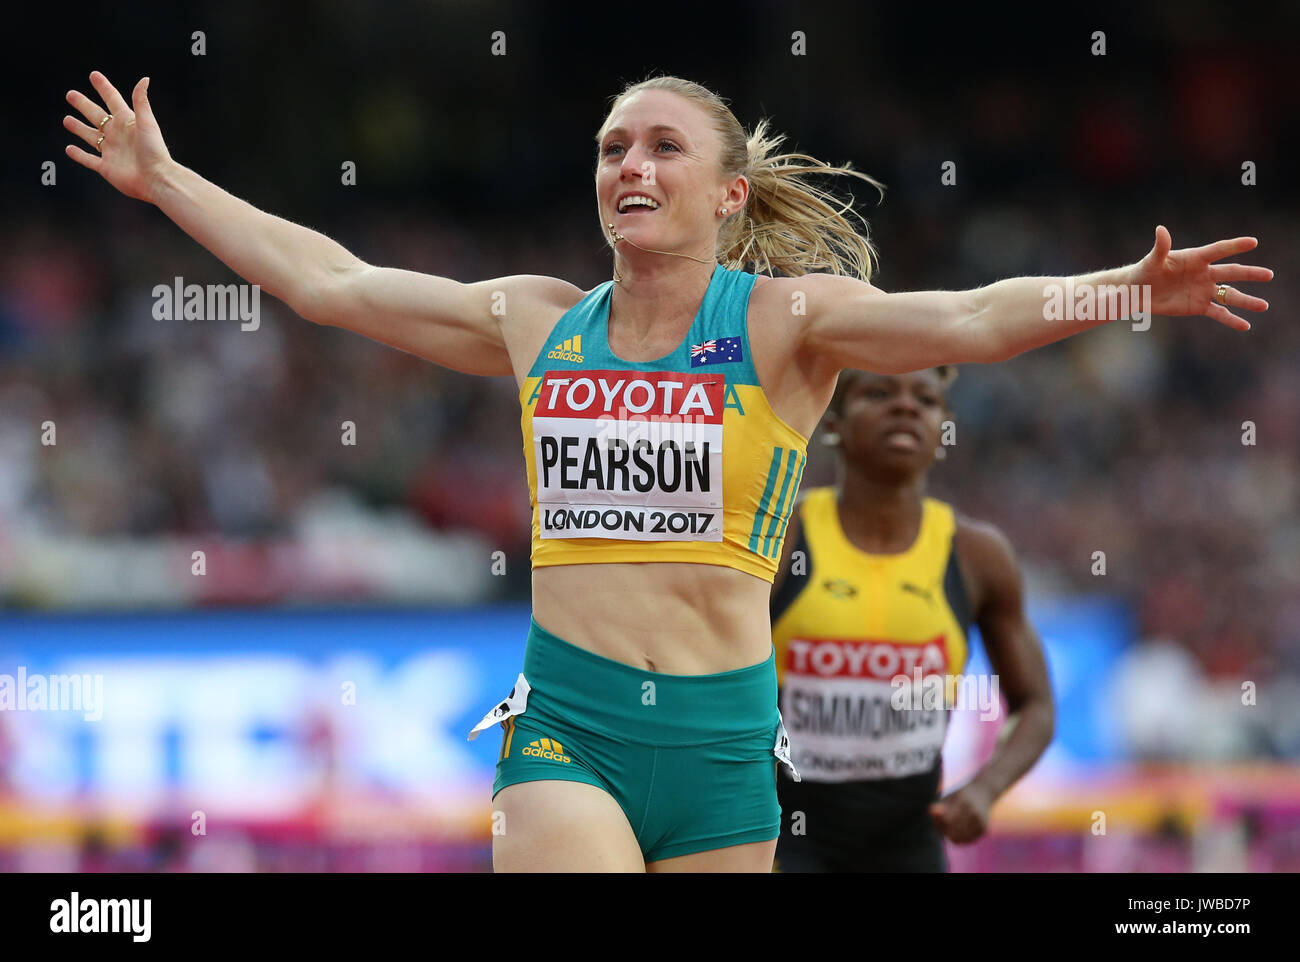 olympic hurdler pearson - 1000×750